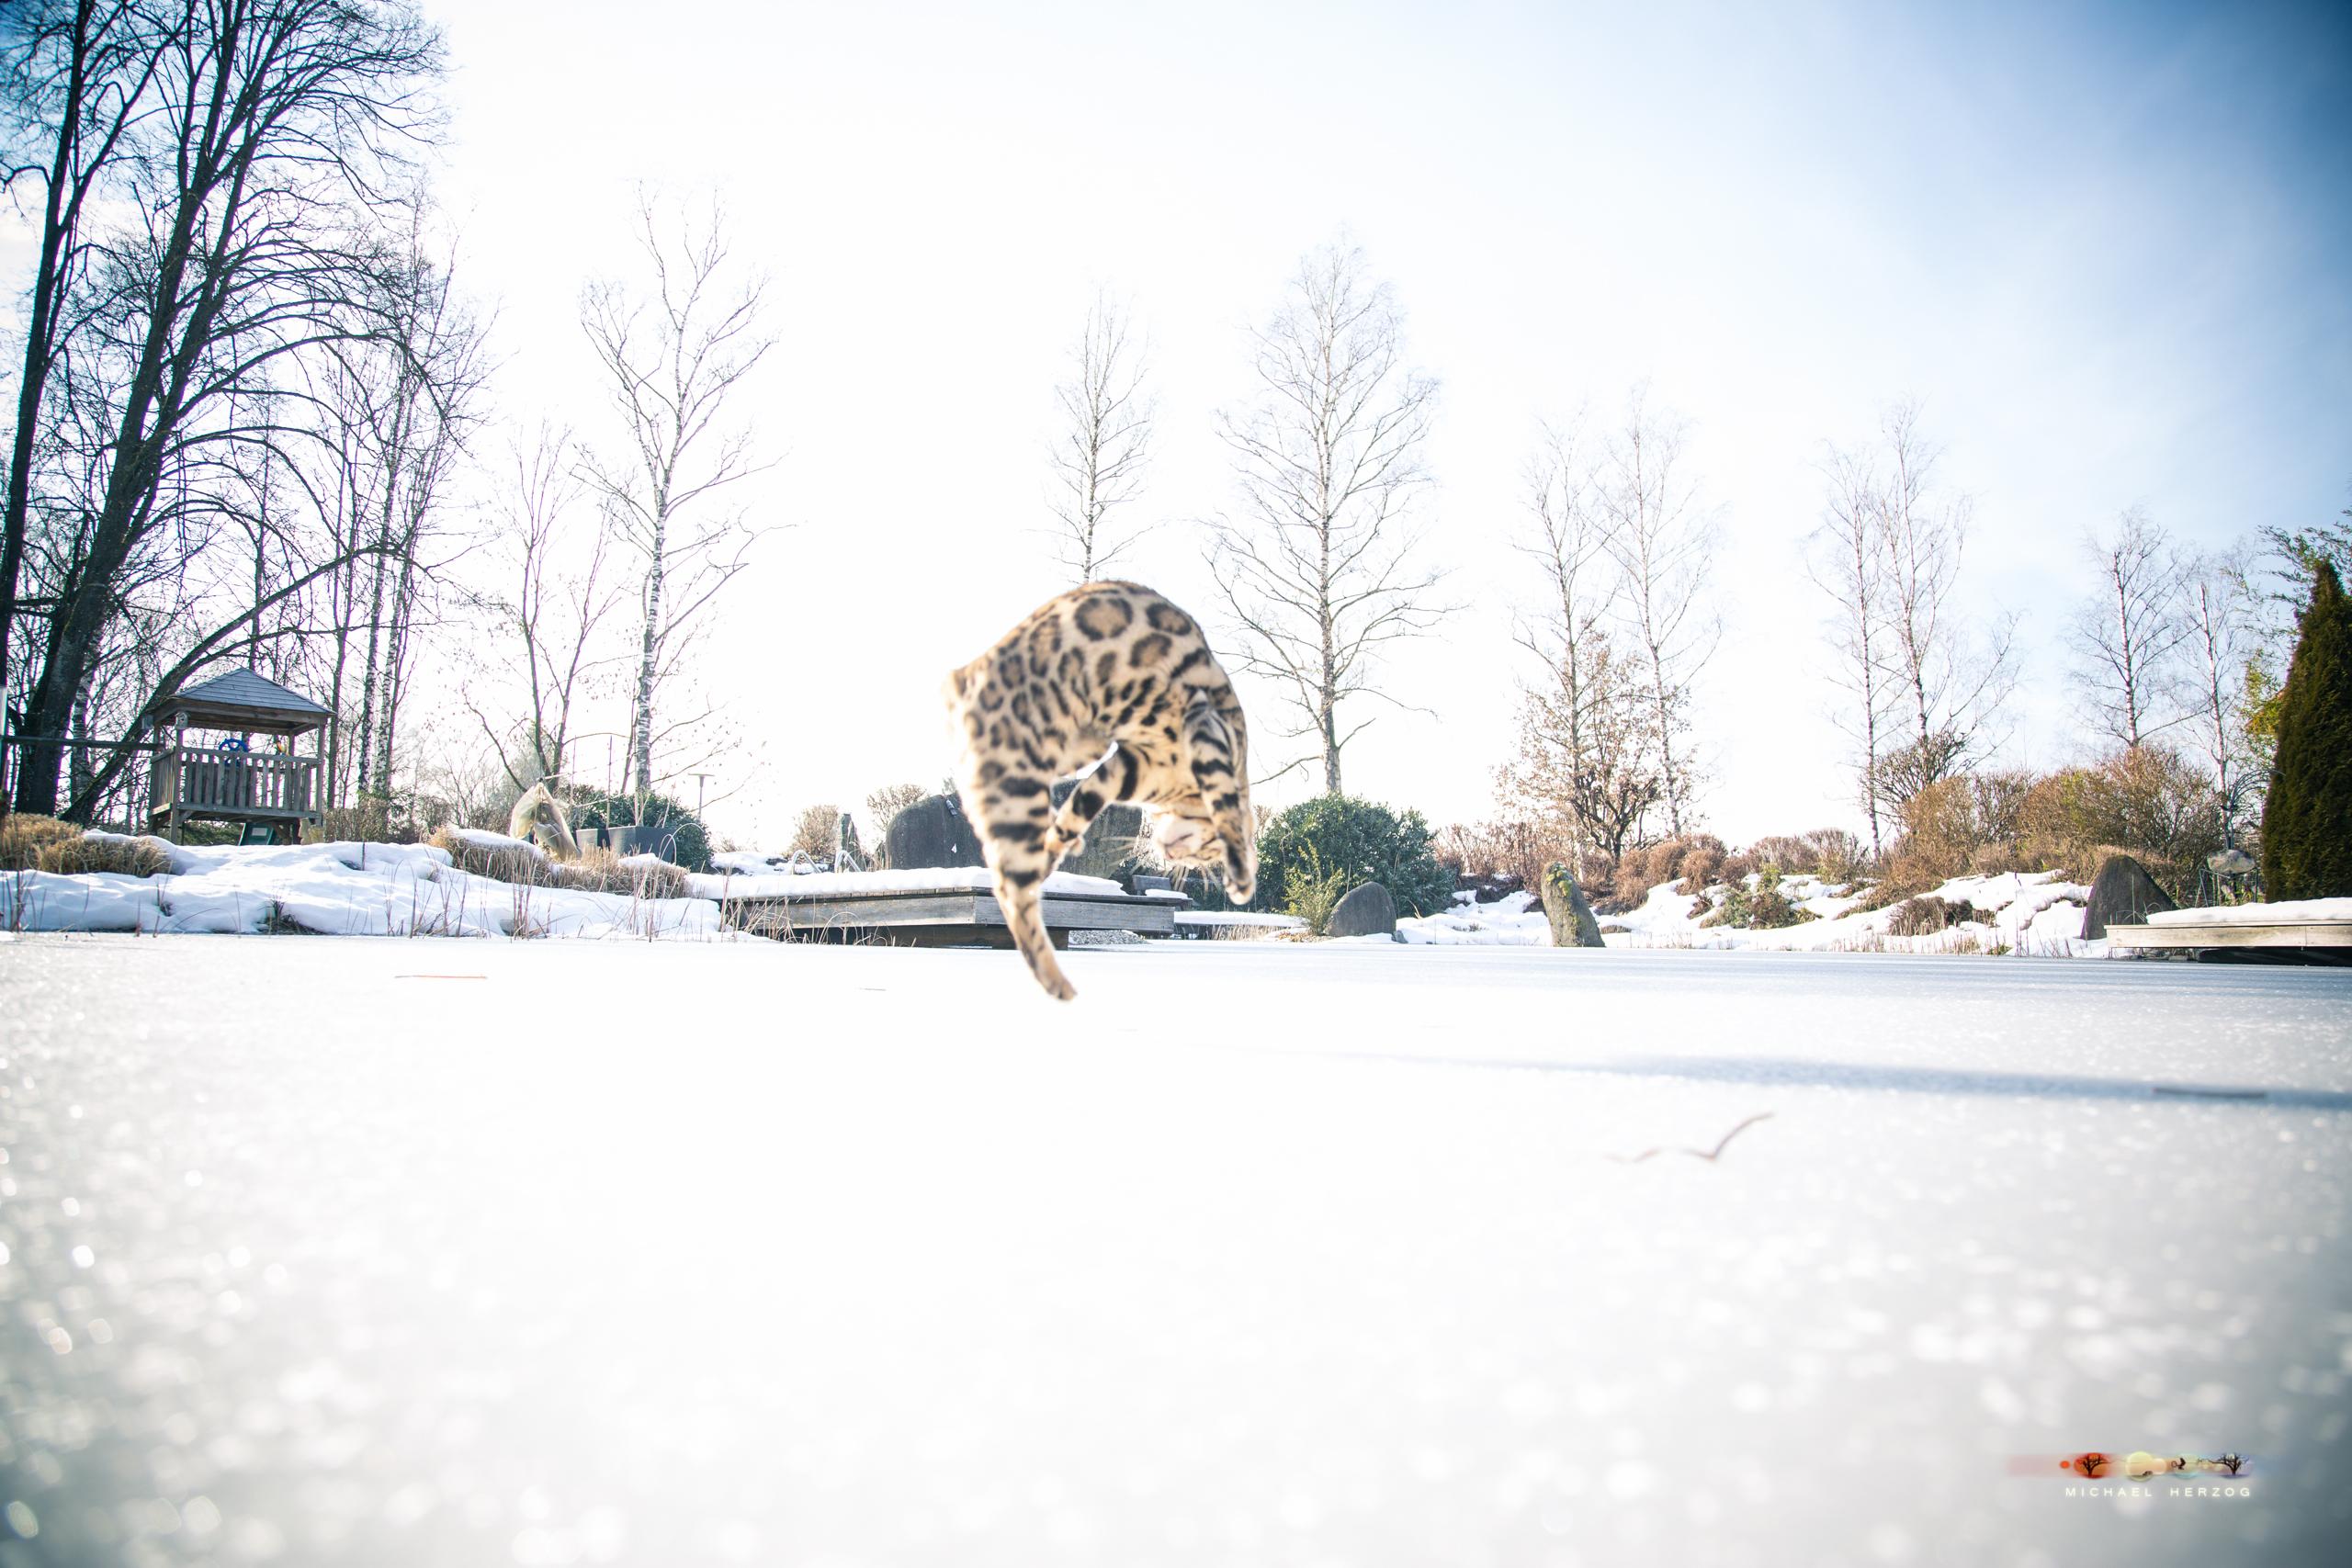 BALUARI_Winter2019_Garten_MichaelHerzog-8934.jpg